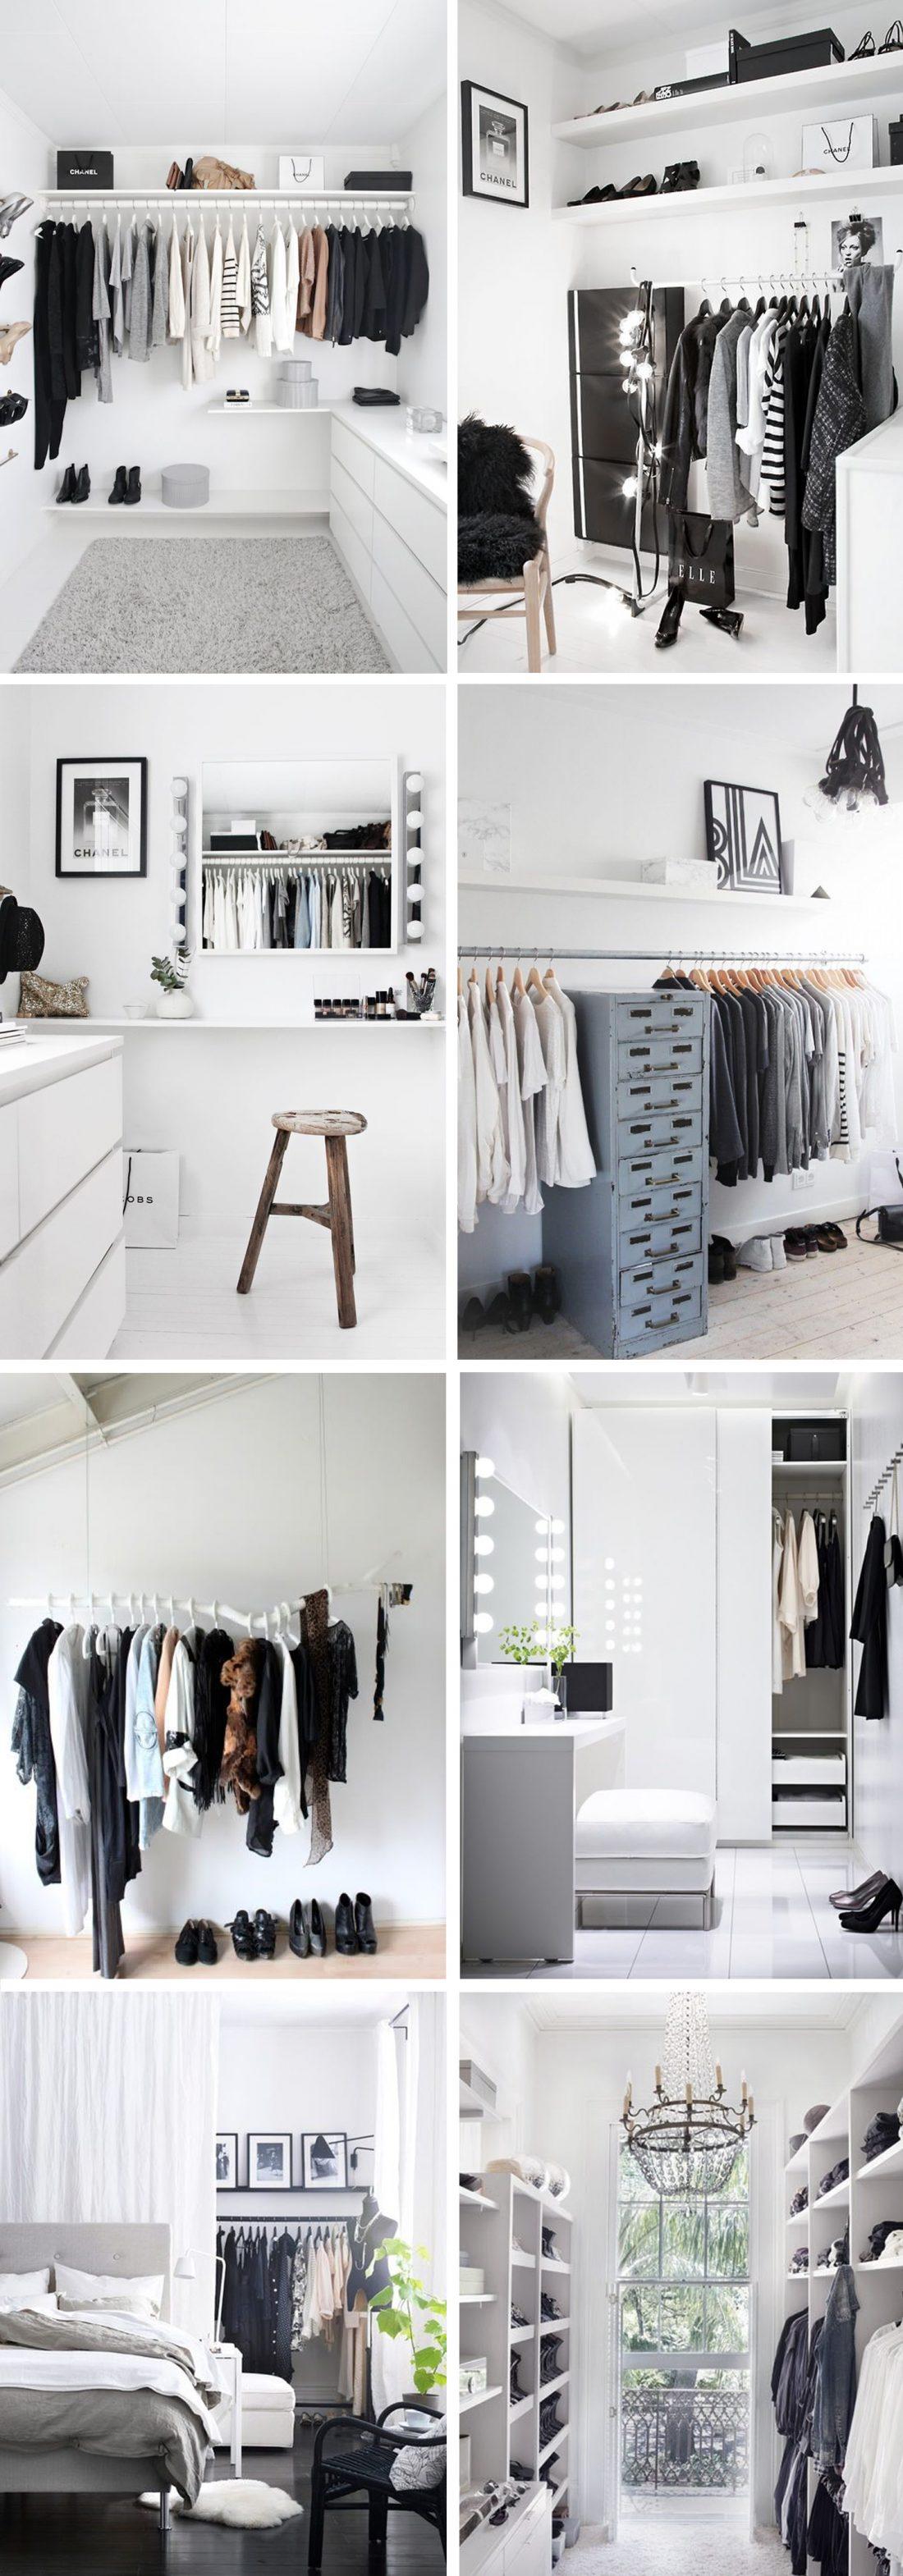 walk-in-closet-garderobe-dressing-room-clothins-rack-clothes-rack-tøjstativ@2x.jpg